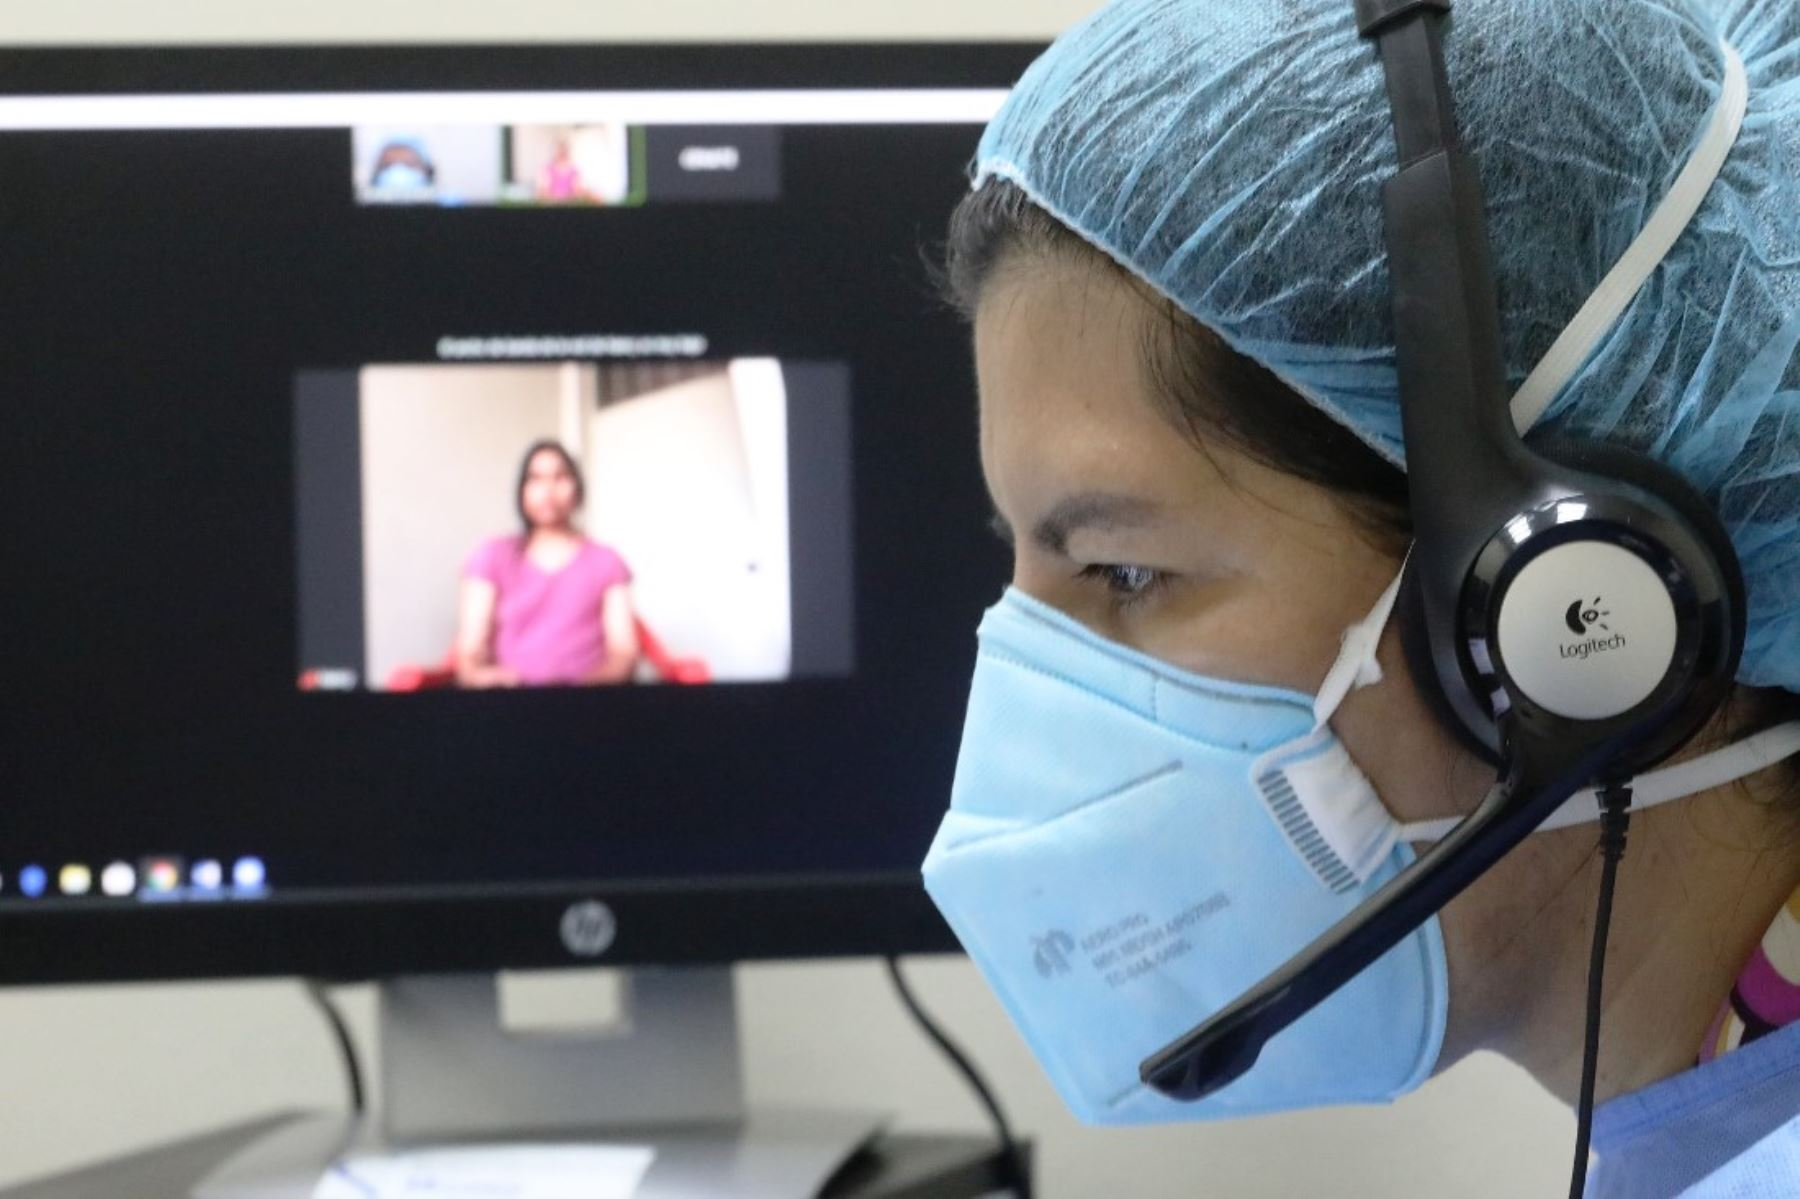 Telemedicina: consultas virtuales diarias crecieron de 250 a 15,000 por pandemia